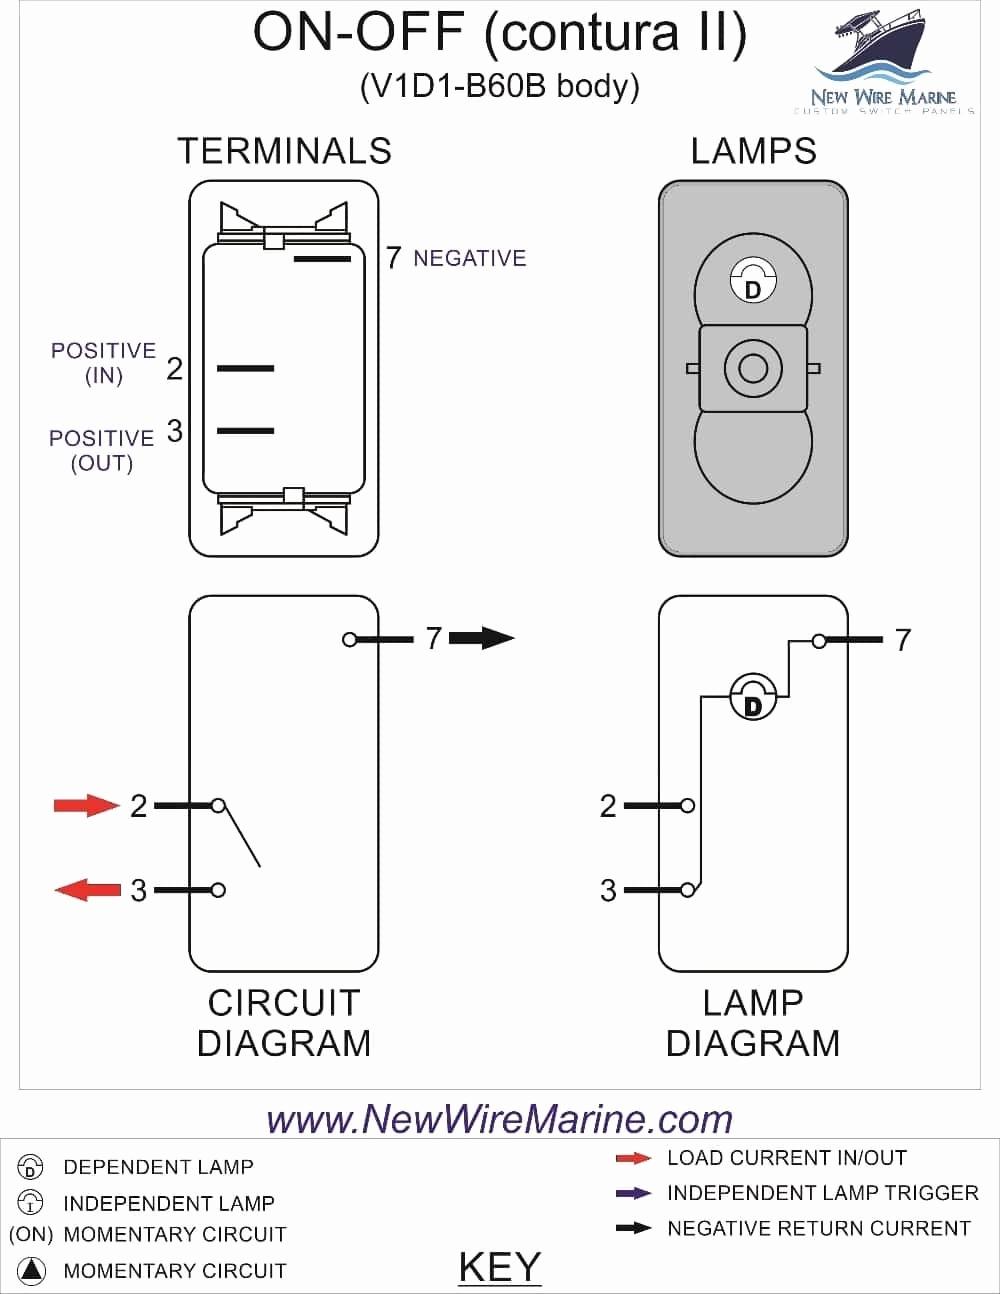 120 Vac Rocker Switch Wiring Diagram - Wiring Block Diagram - Lighted Rocker Switch Wiring Diagram 120V